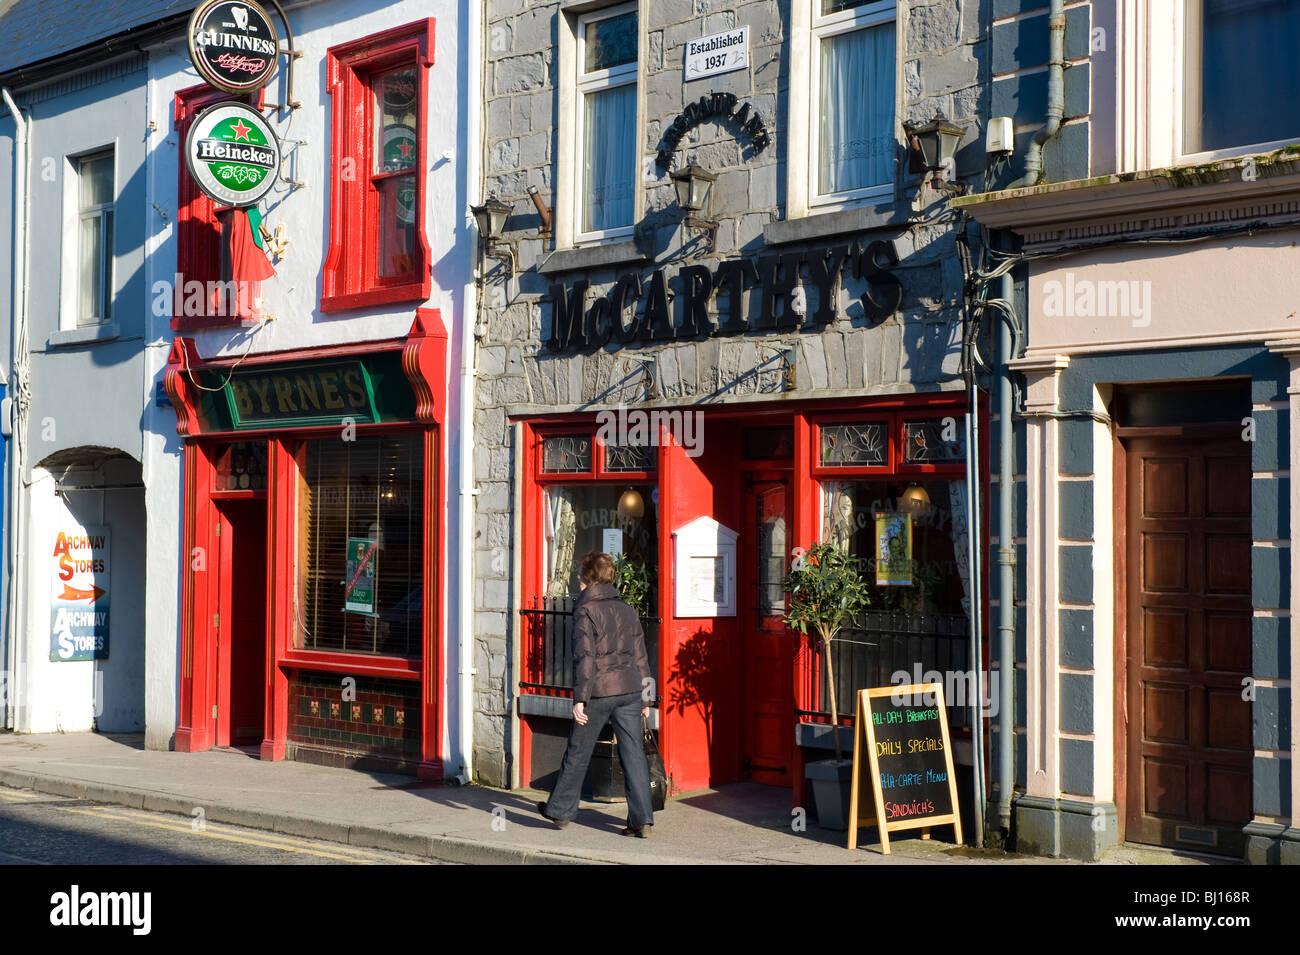 Market Street, Castlebar, Co. Mayo, Ireland. - Stock Image